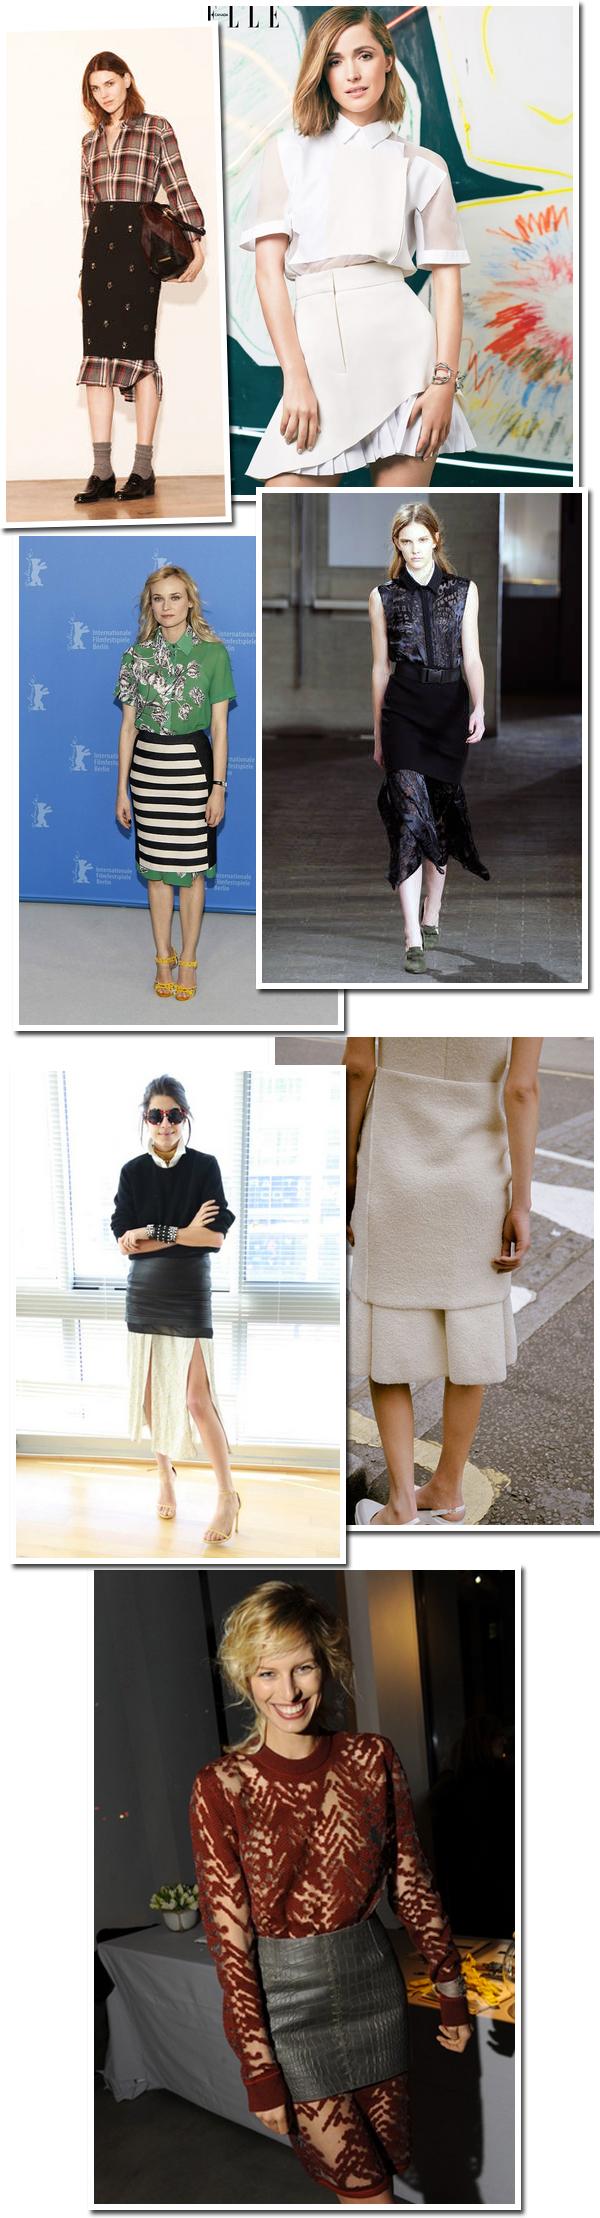 moda-look-tendencia-camisa-longa-saia